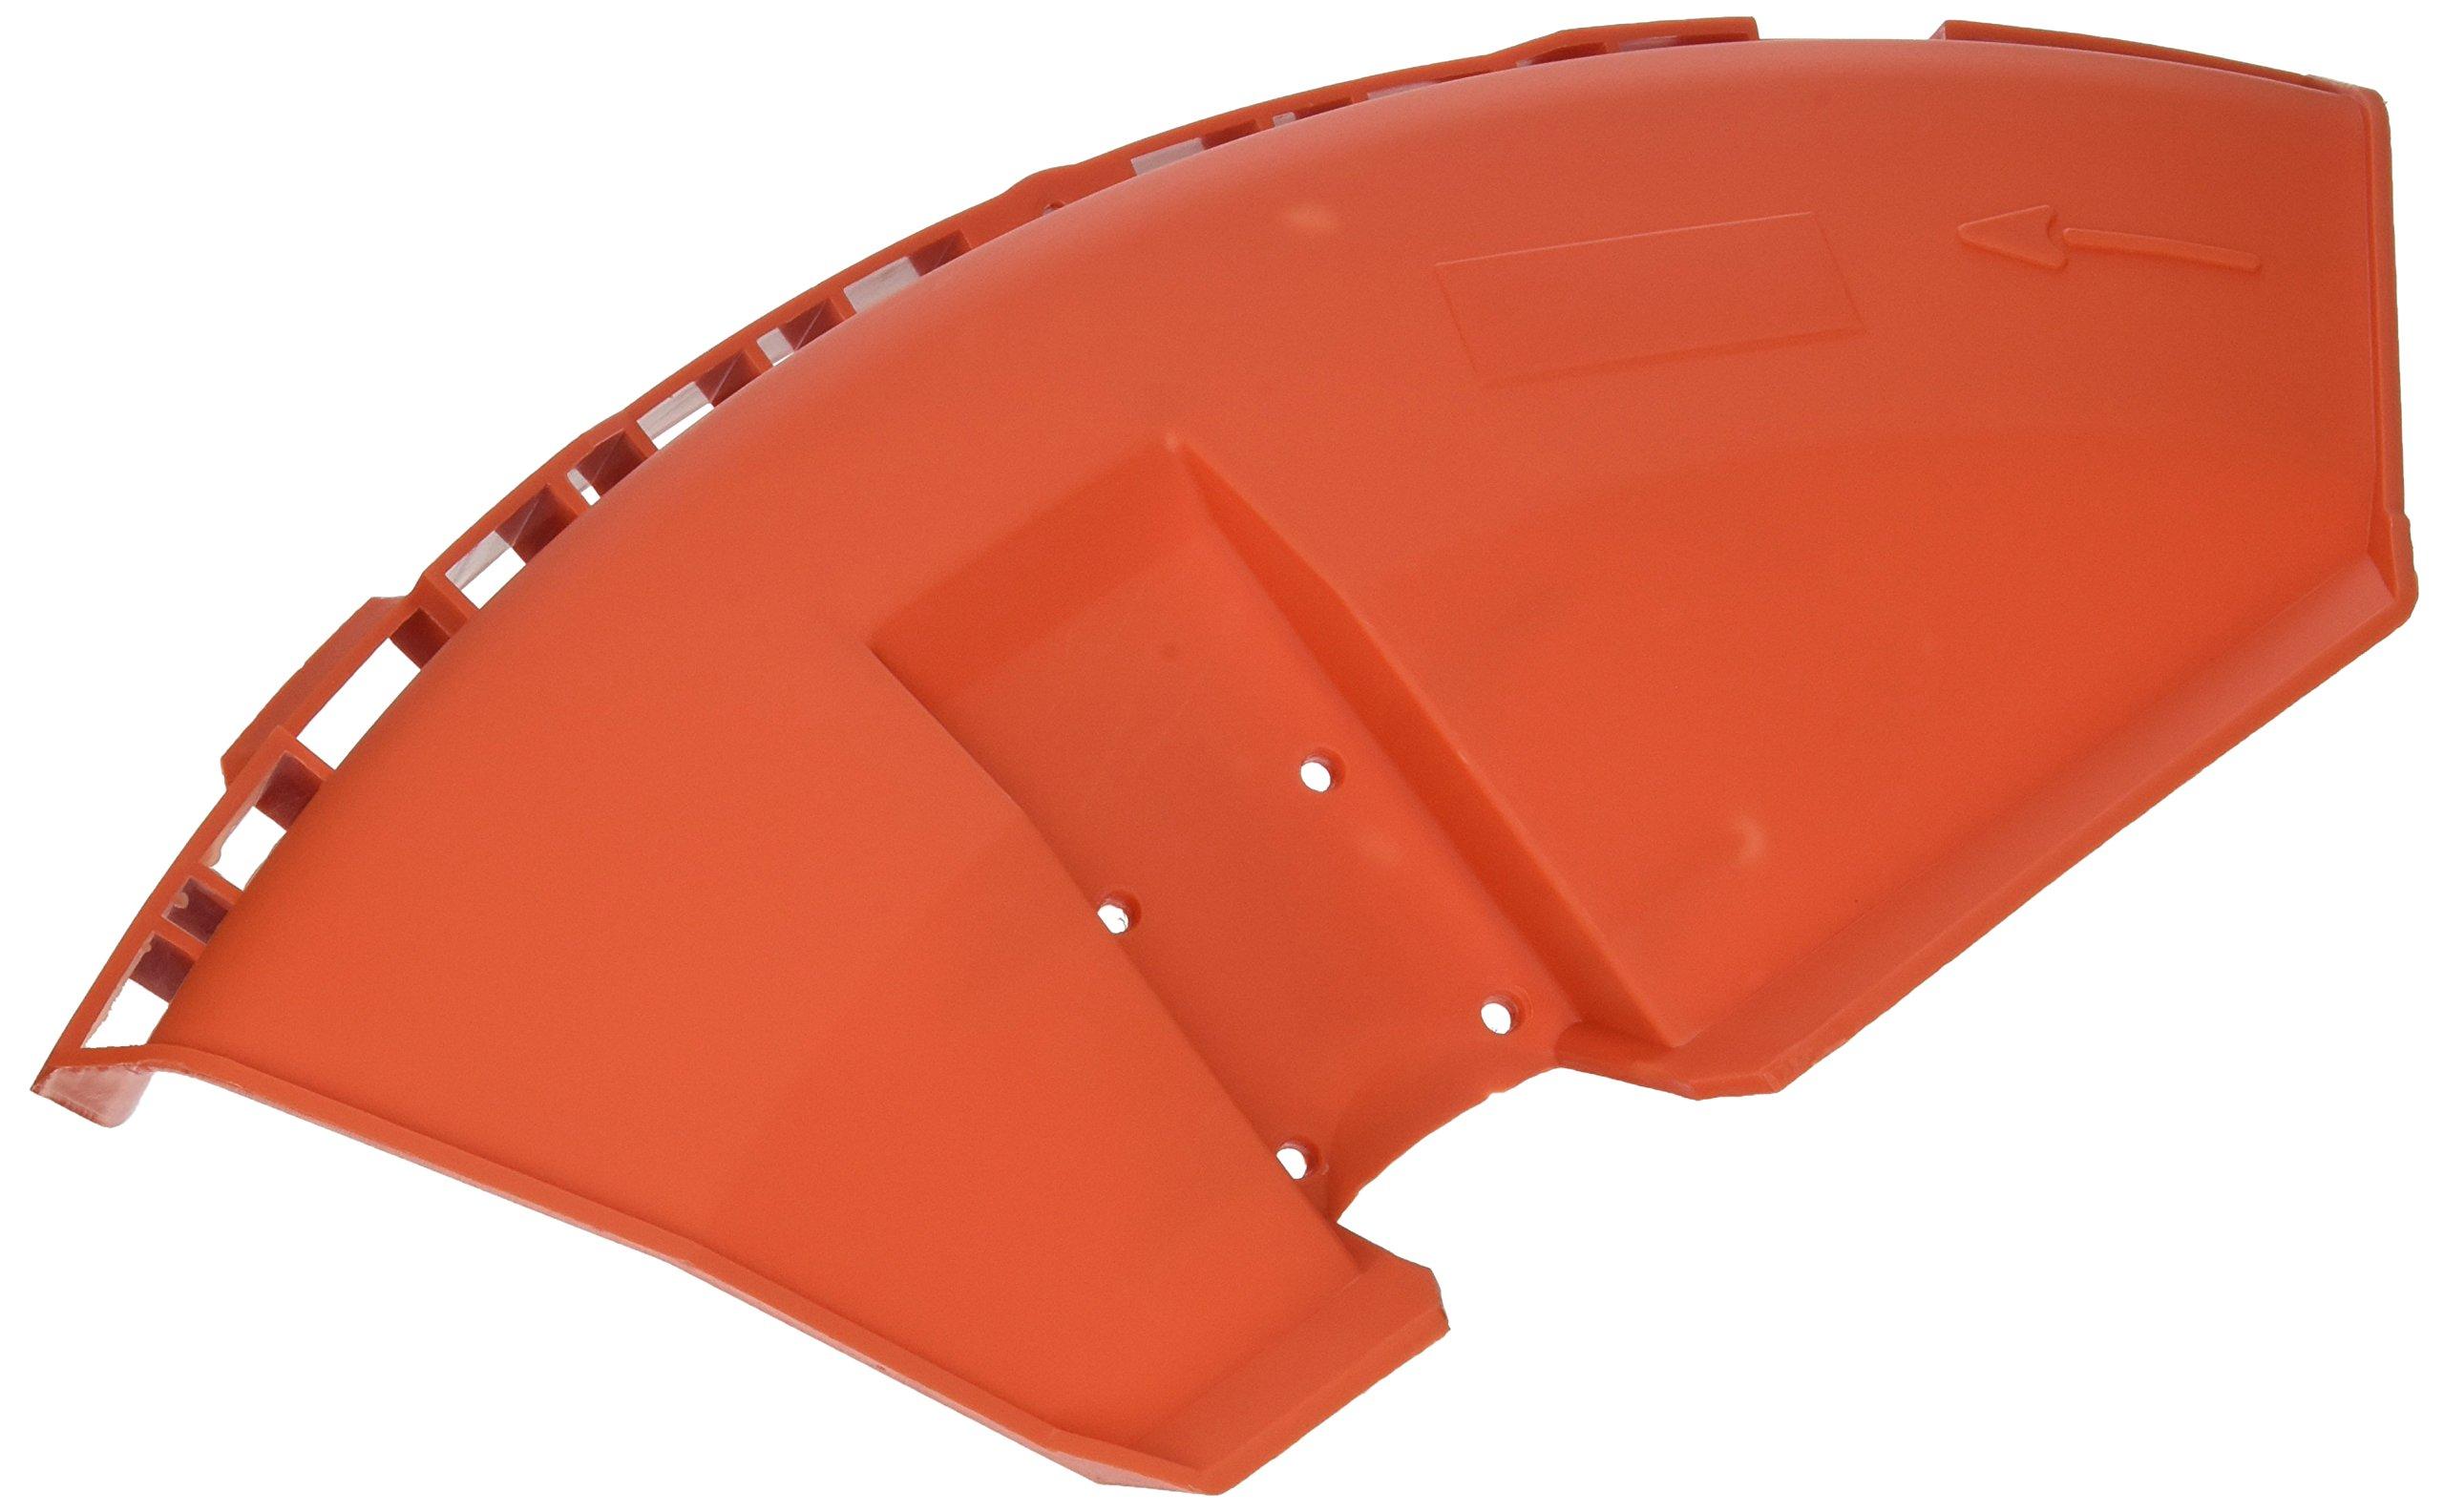 Hitachi 7790324 Safety Guard